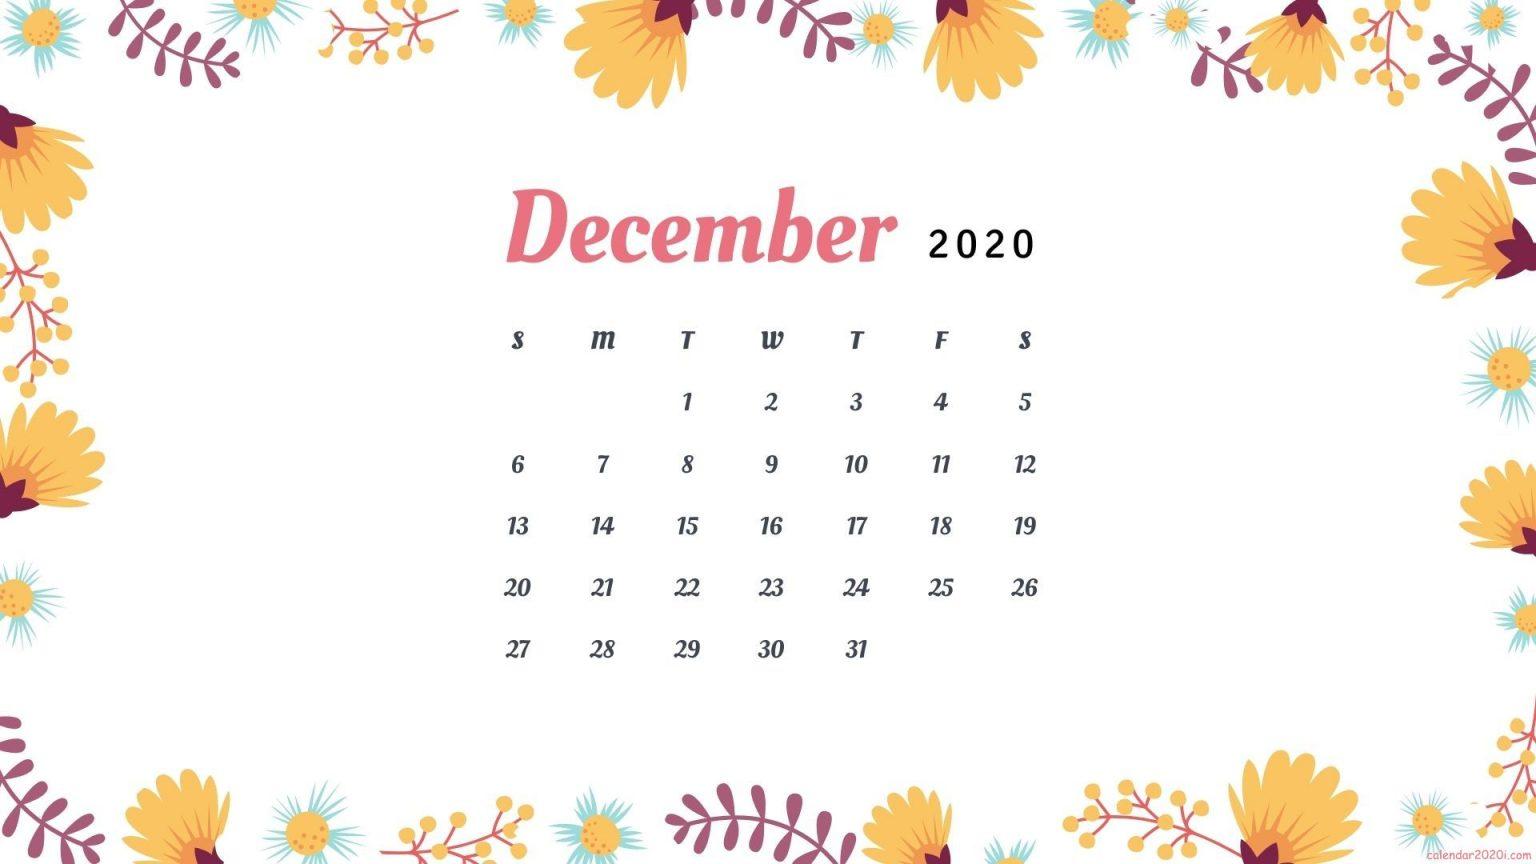 December 2020 Calendar Wallpaper Download